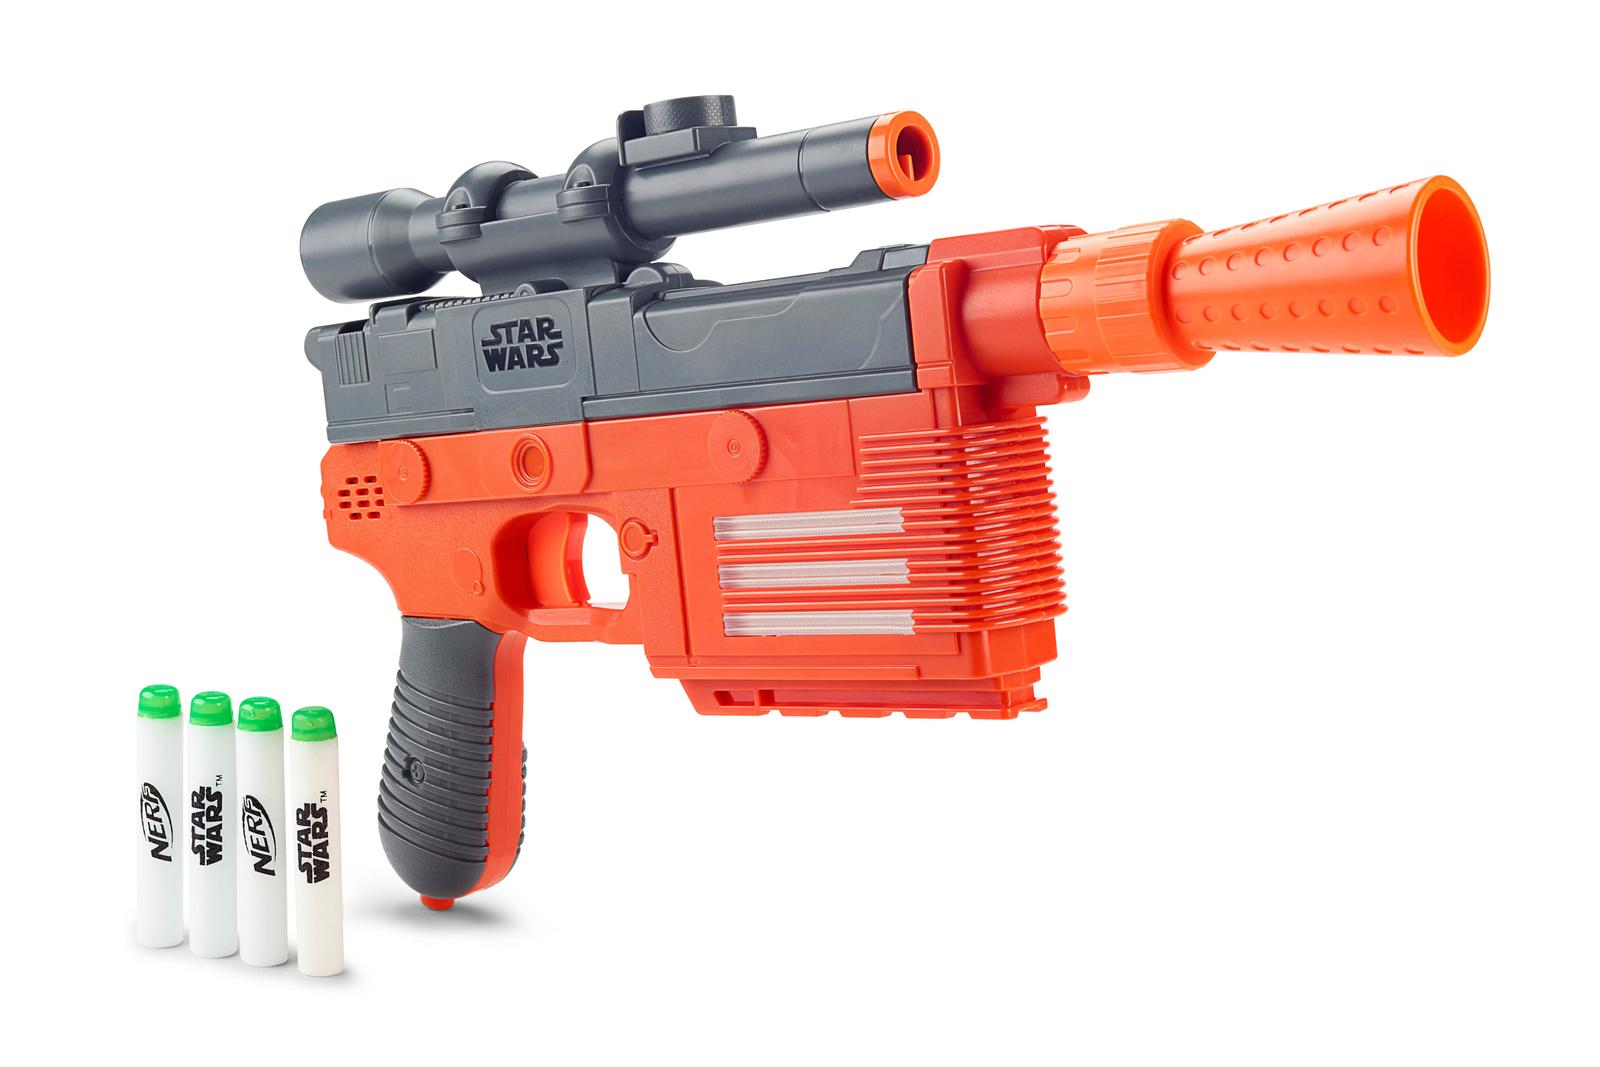 NERF Glowstrike Han Solo Blaster.